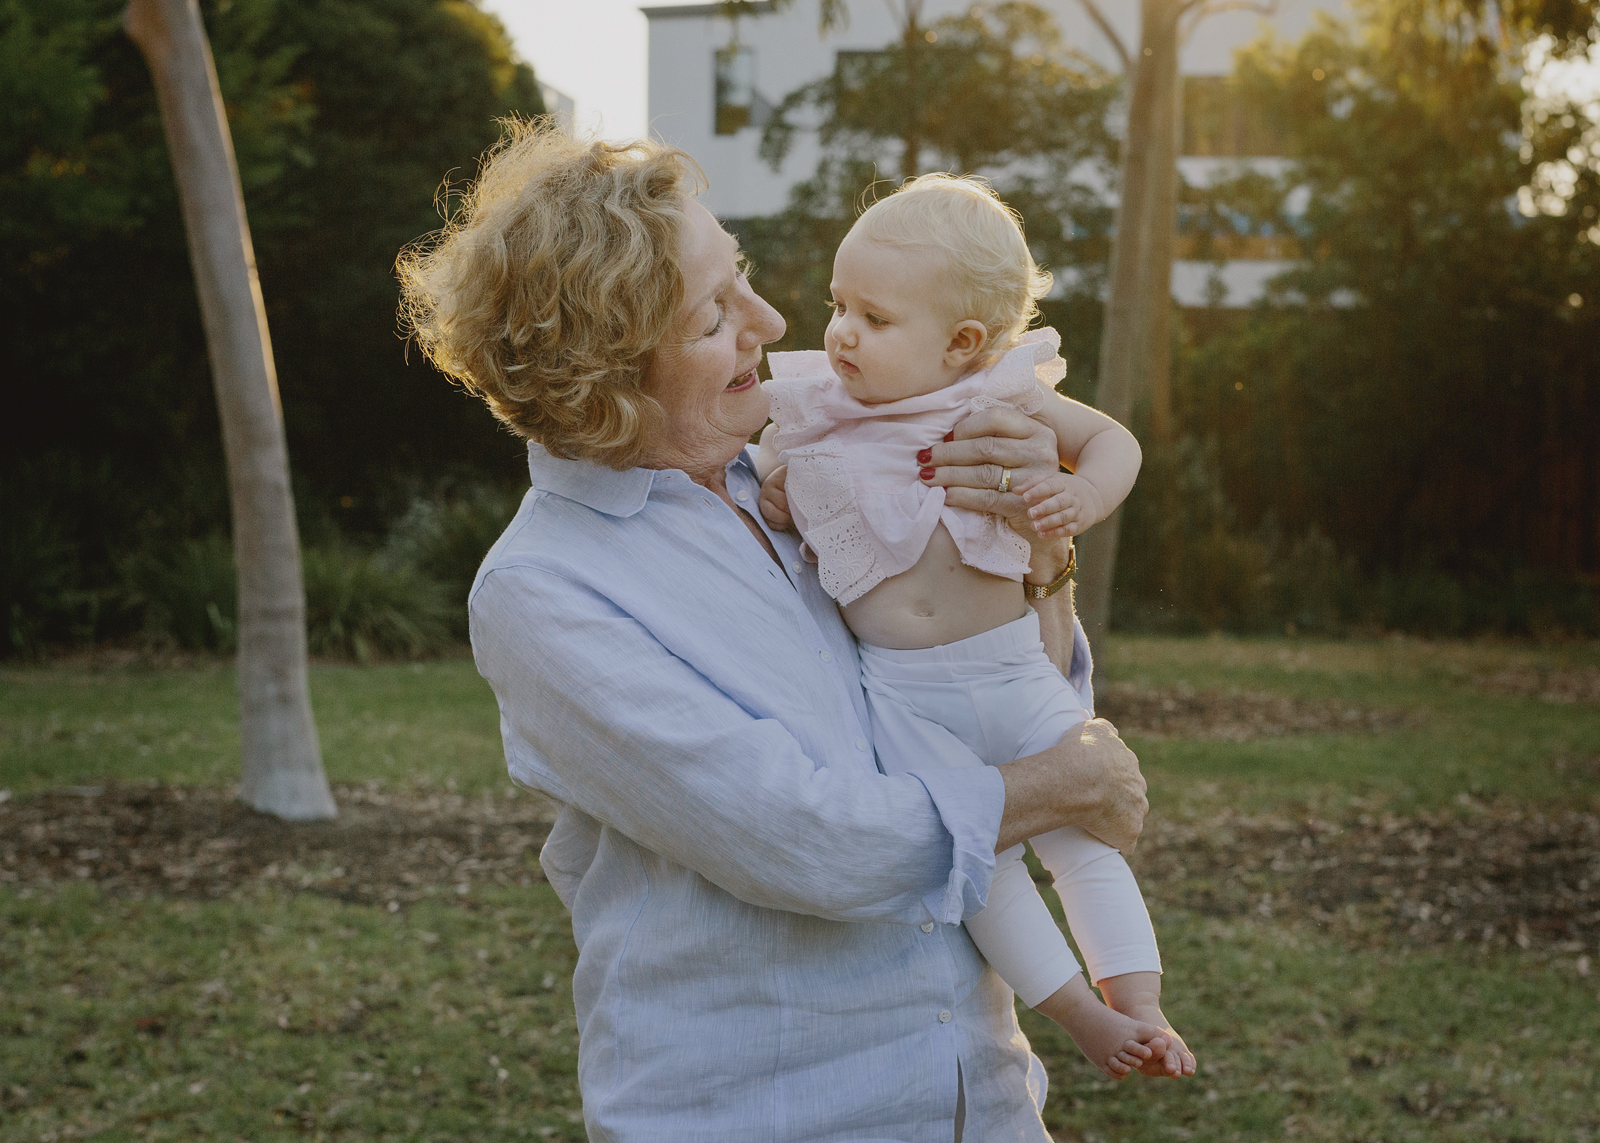 Nana cuddling her baby grandchild